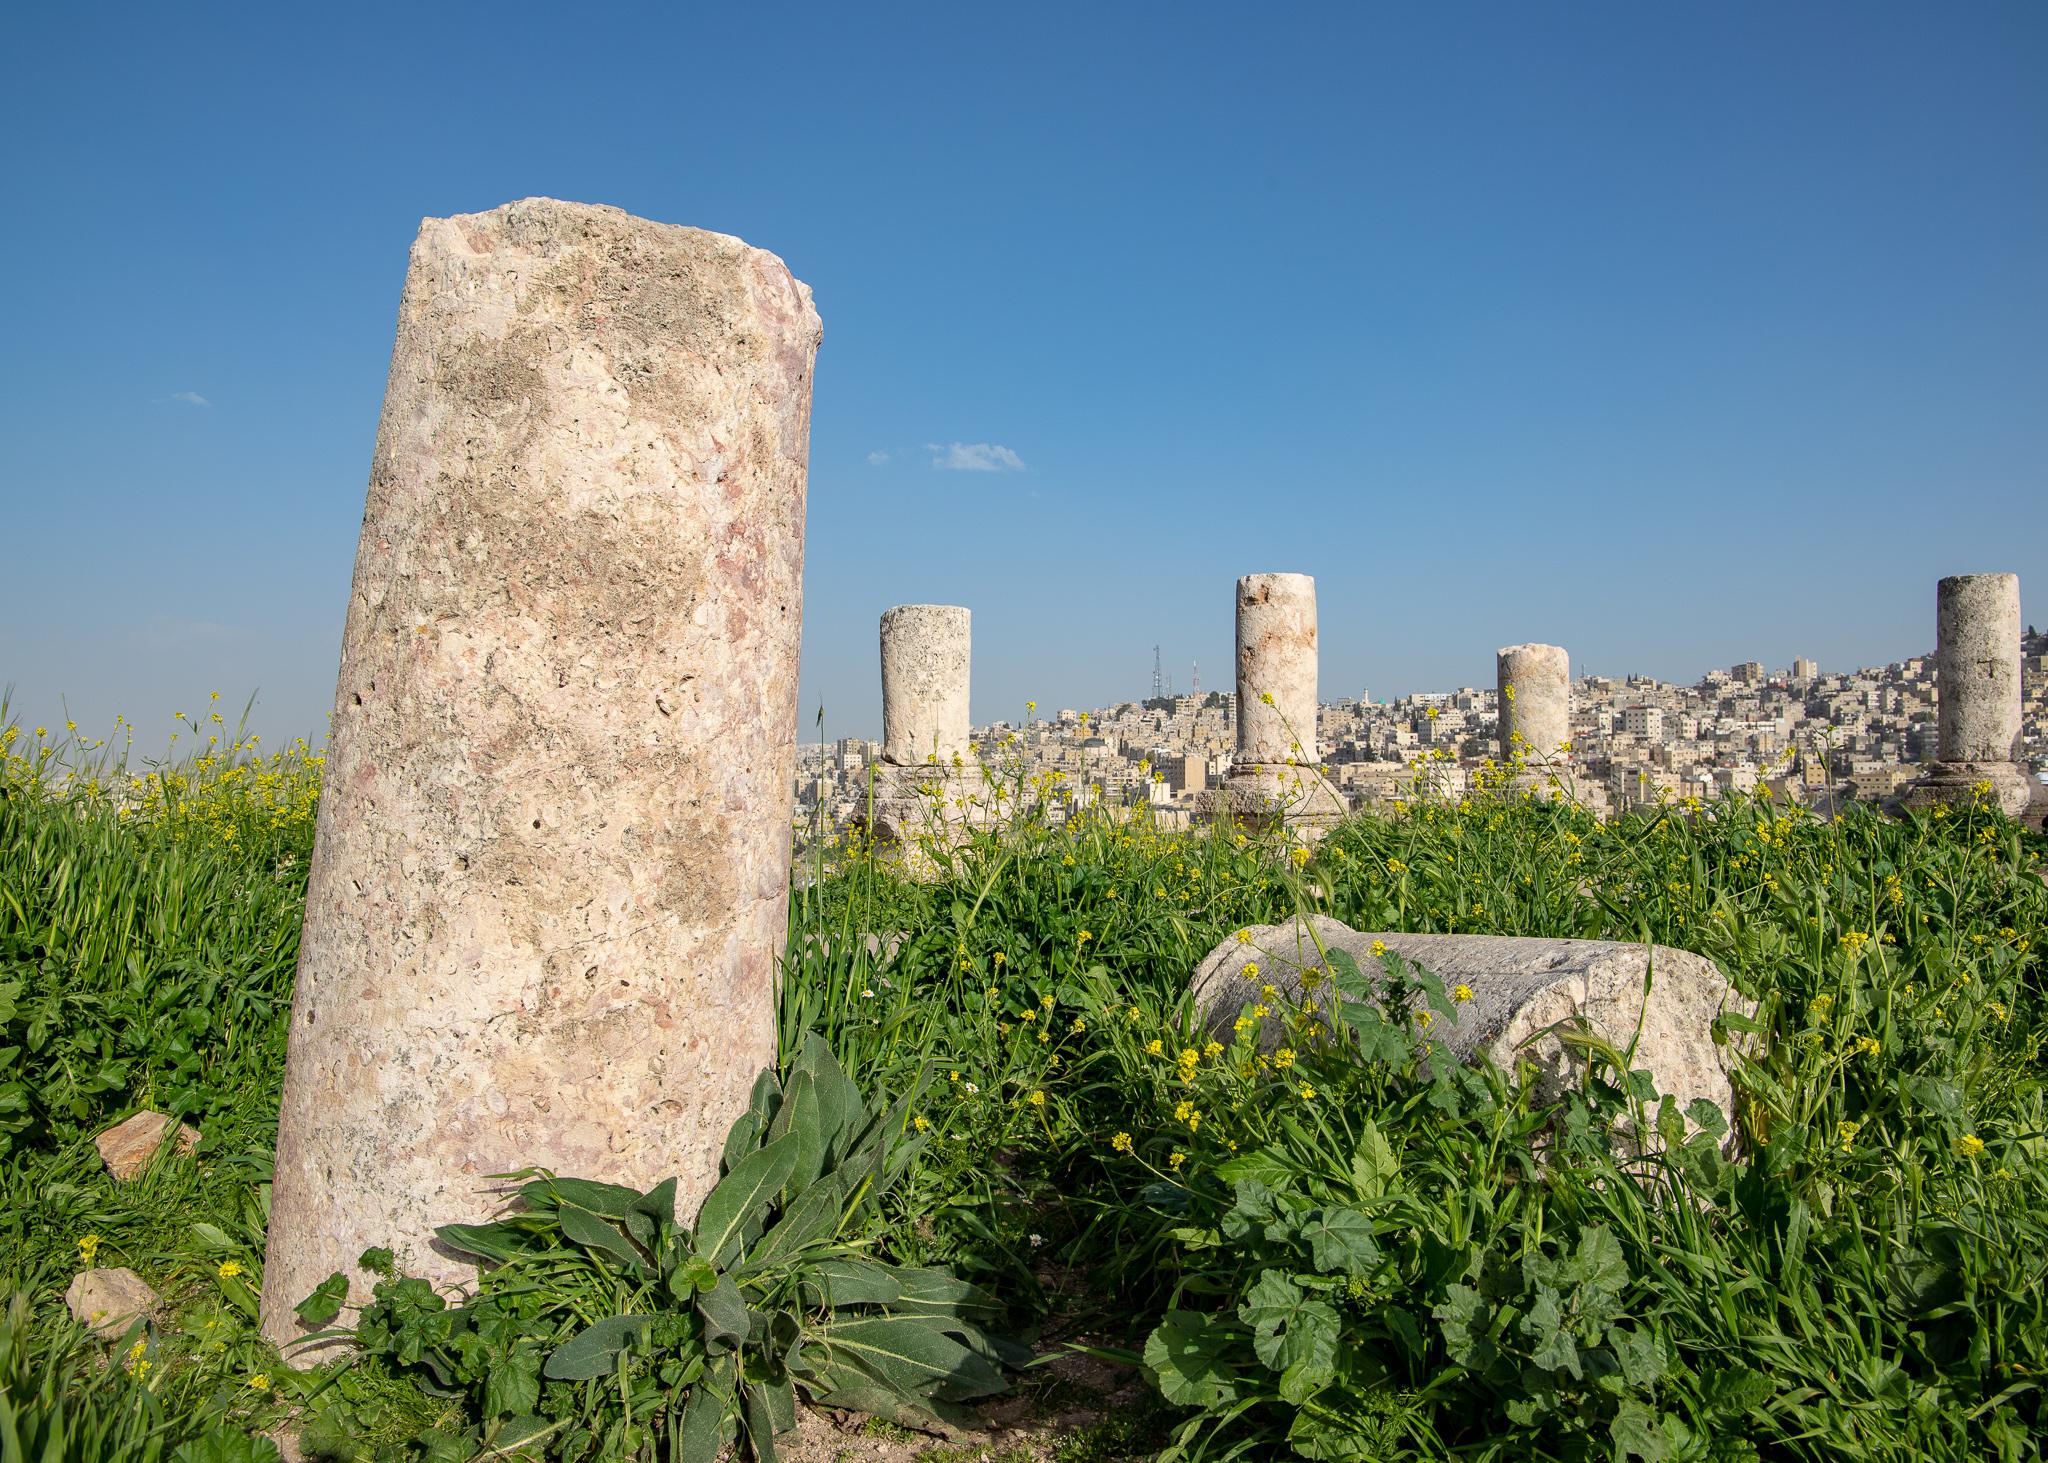 Pillars just left lying around